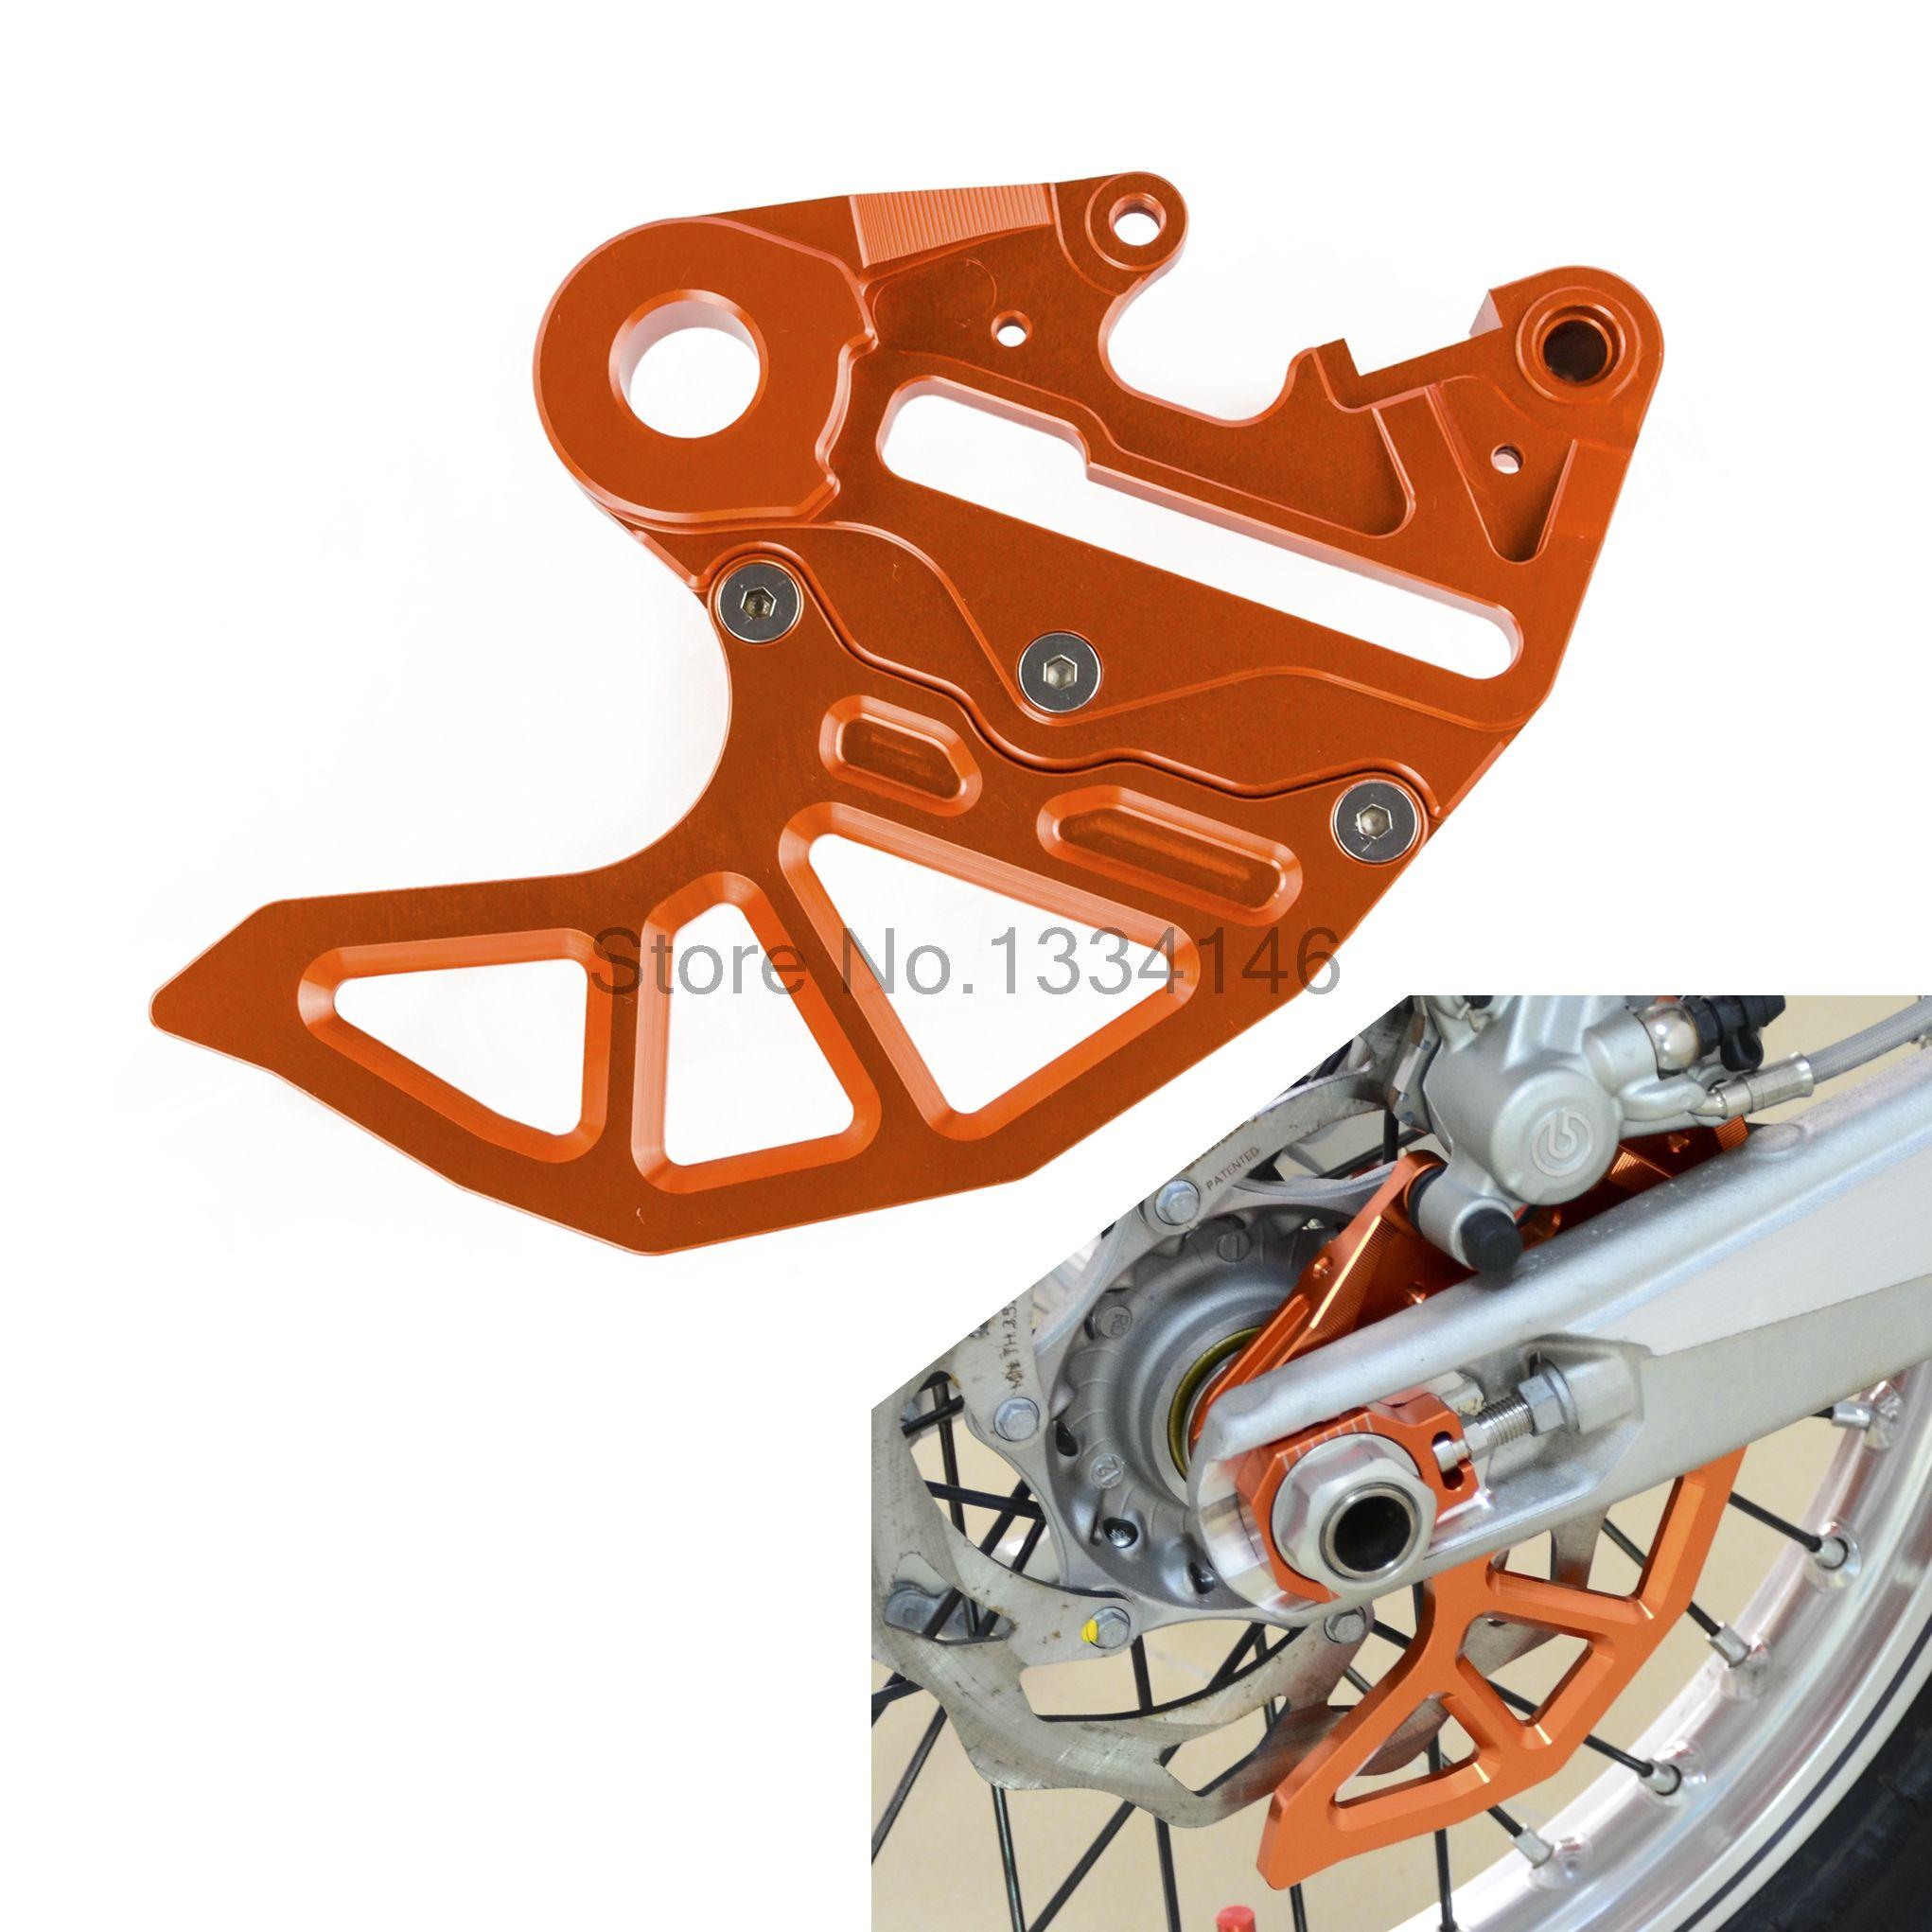 Radius Universal Road Bike Composite Arm Brake Caliper Kit Aluminum Front /& Rear